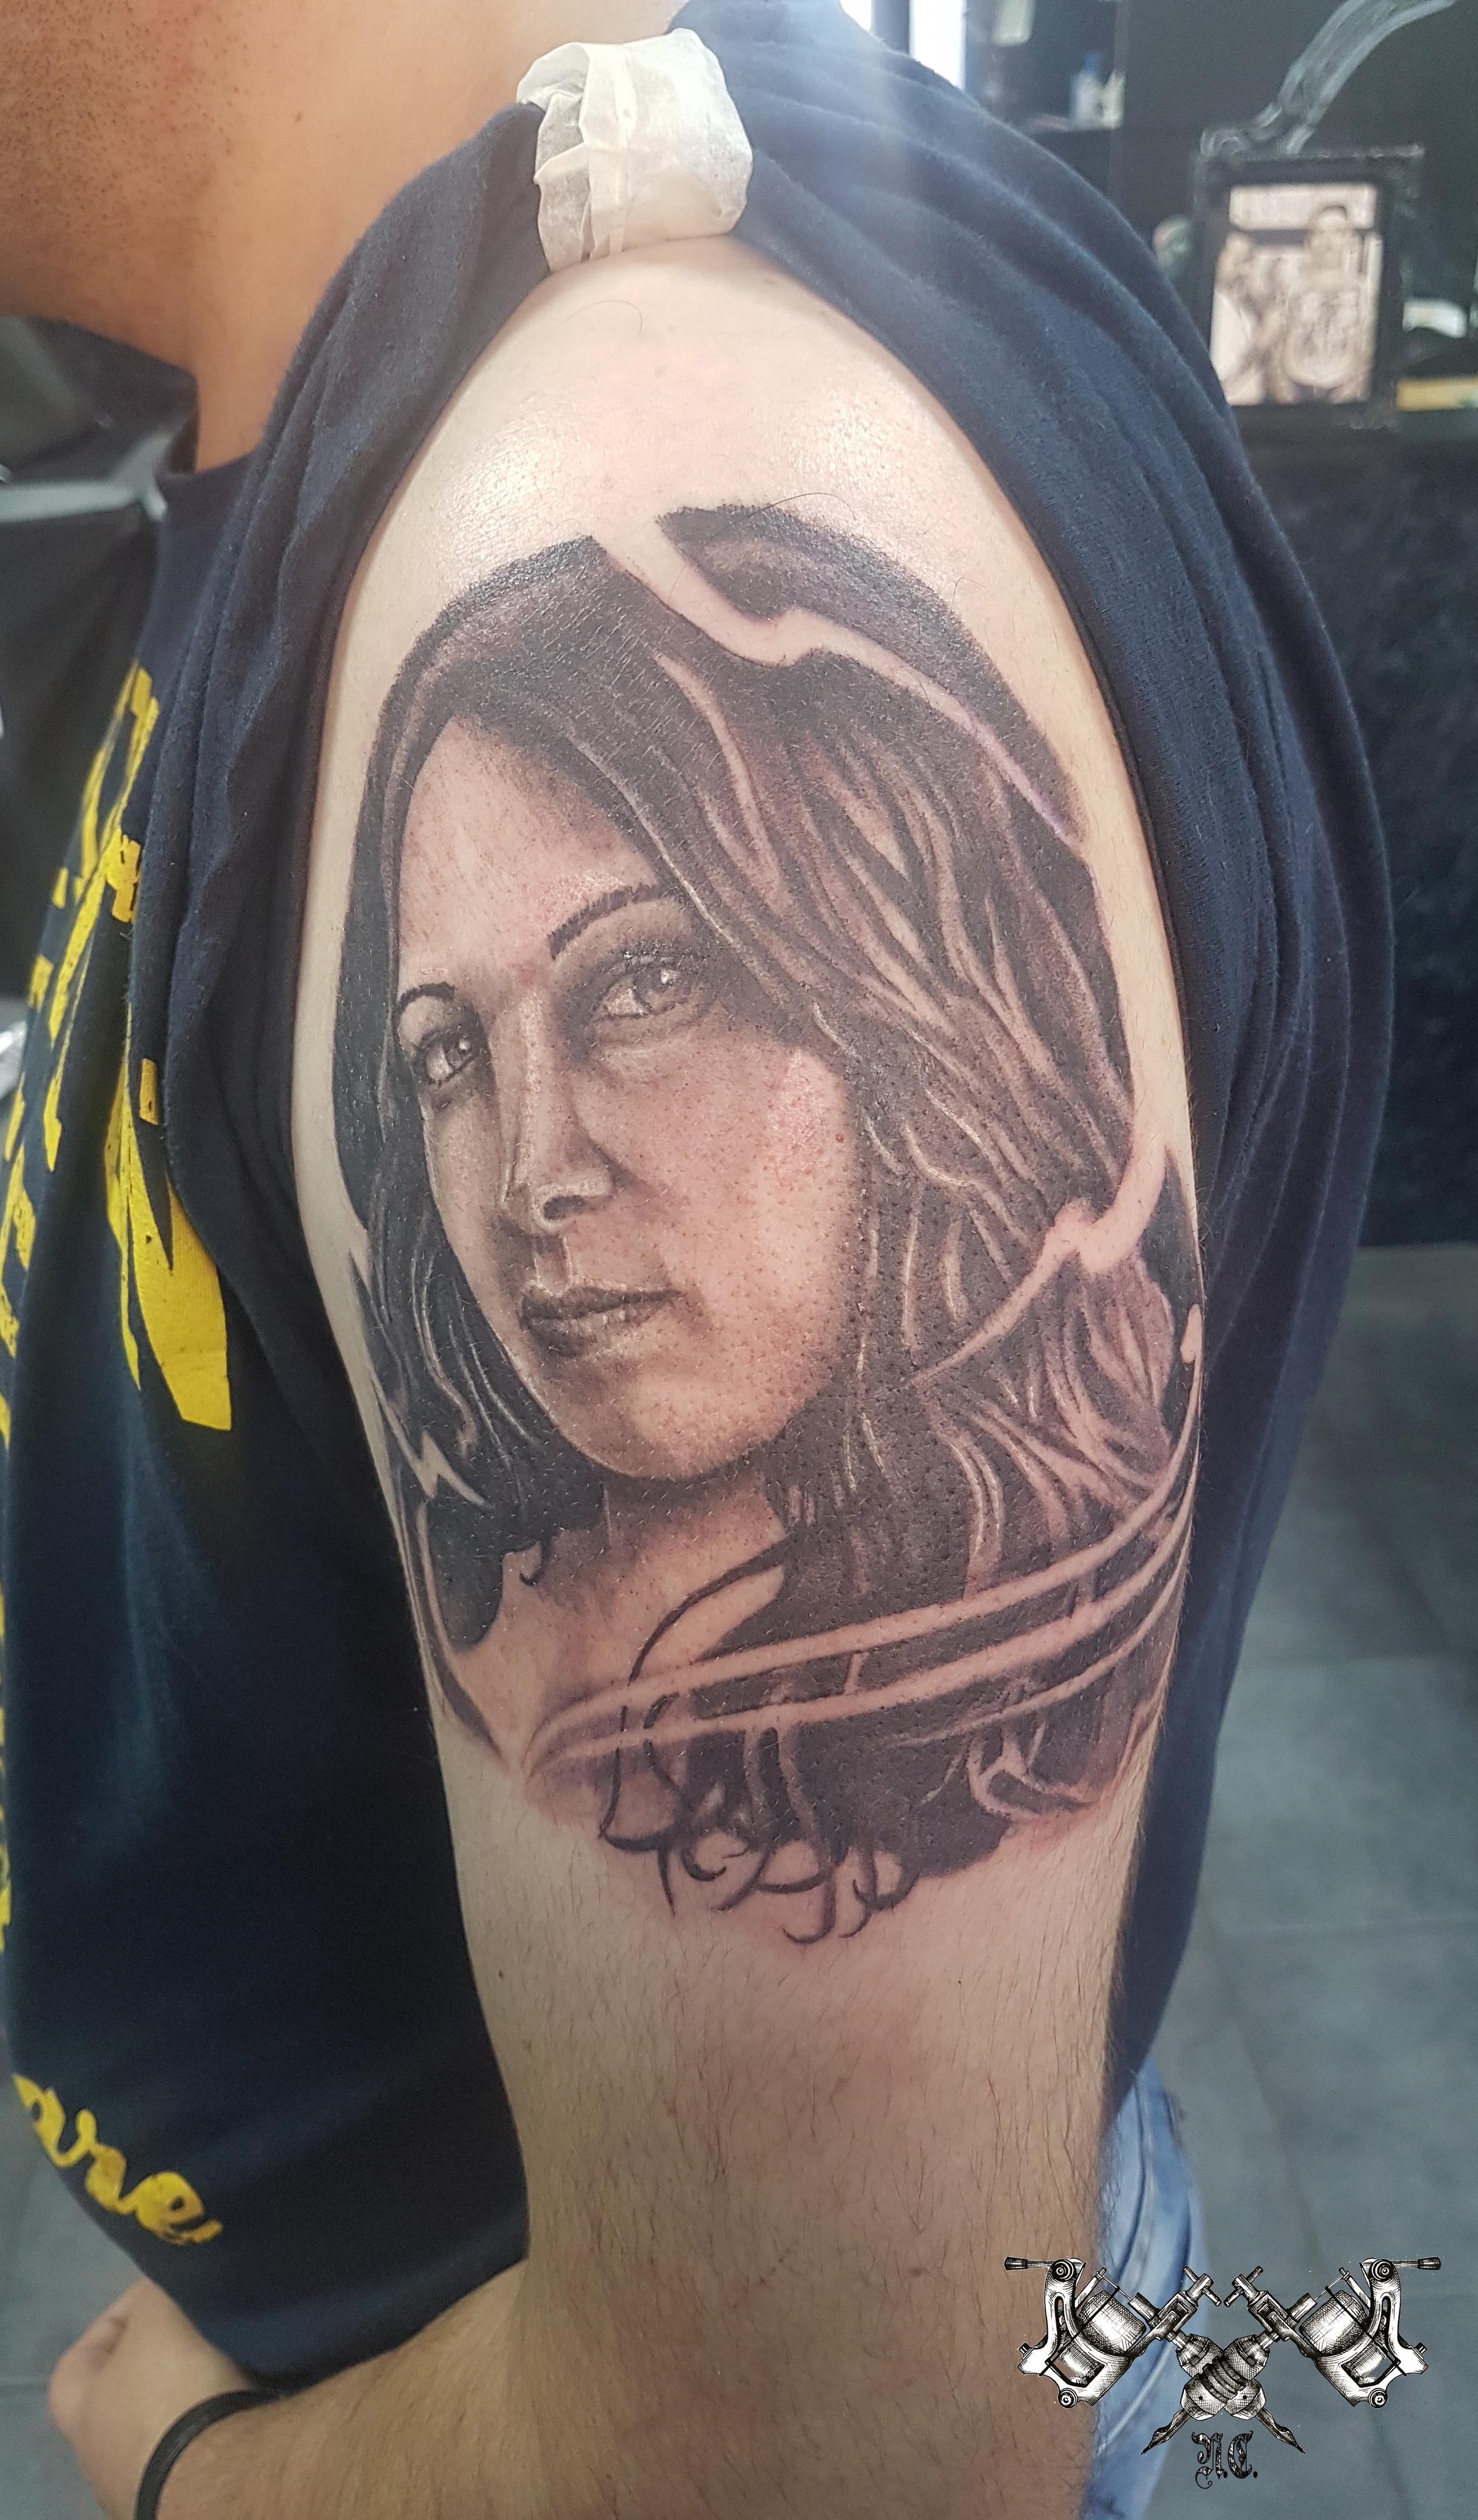 Next Chapter Tattoo & Piercing Studio